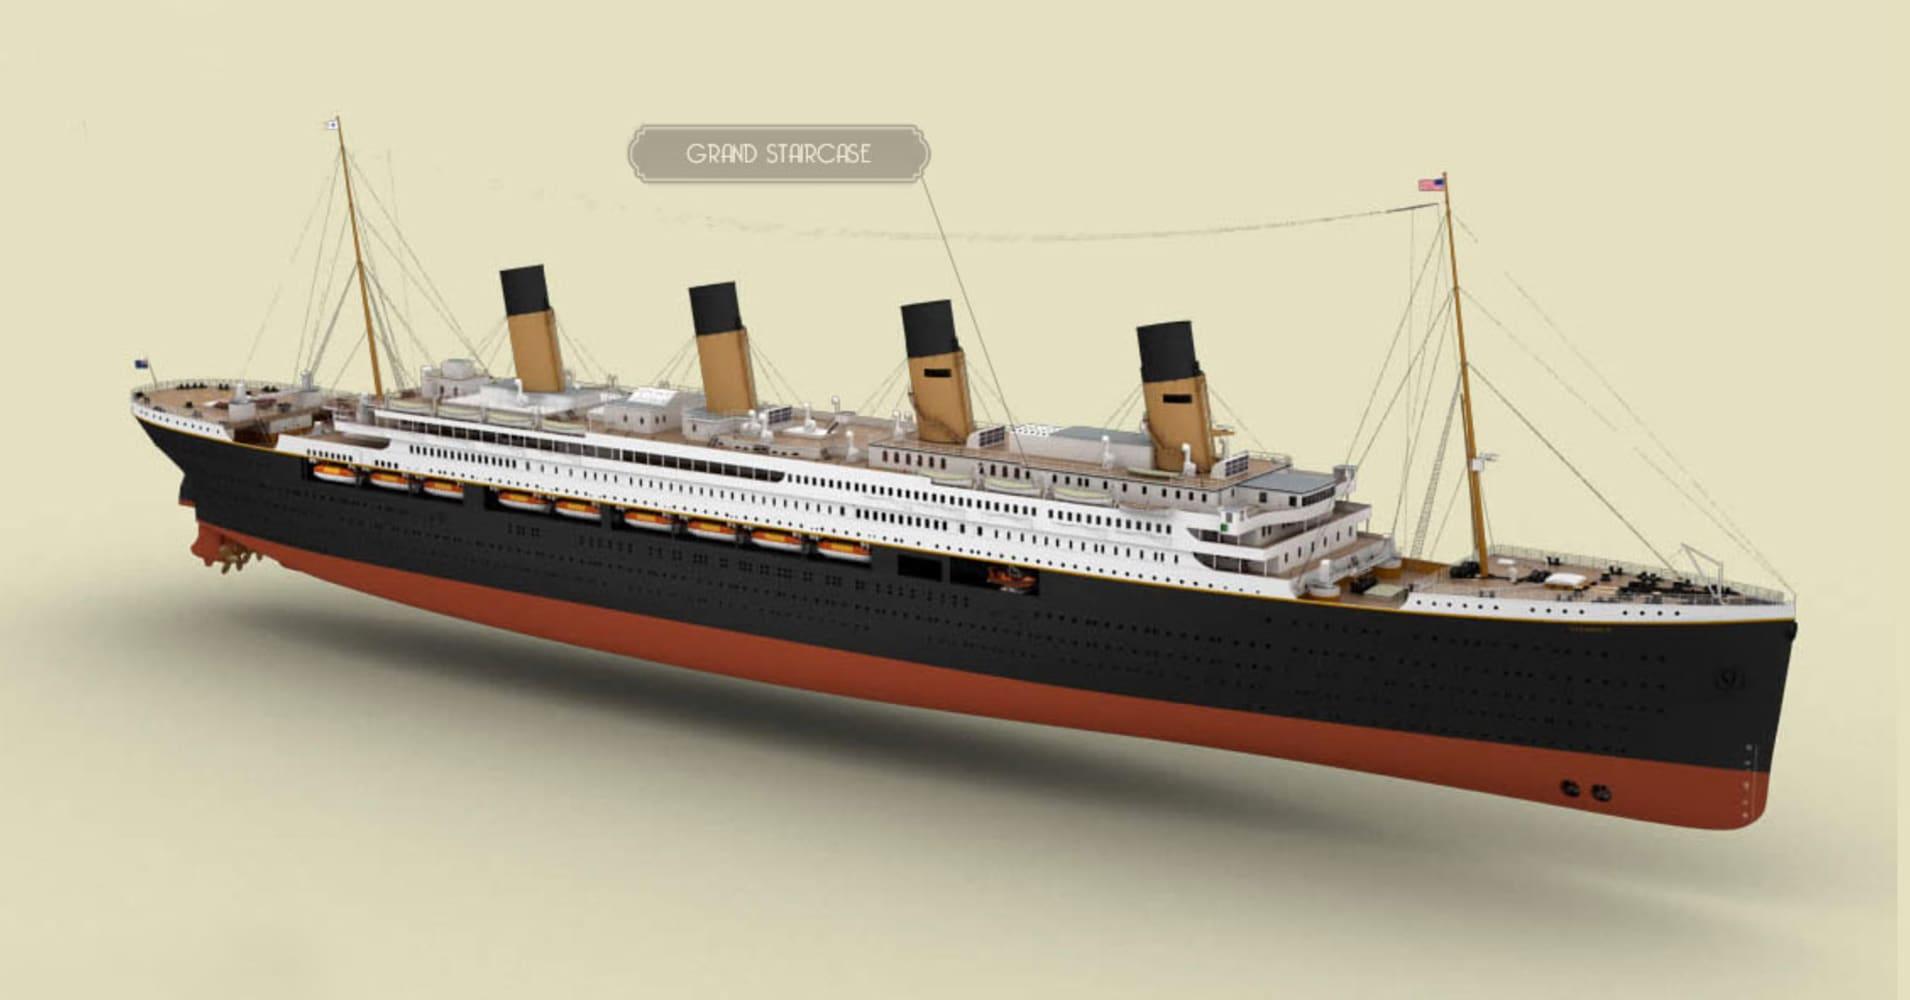 Titanic Ii Replica Of Doomed Ship To Set Sail In 2018